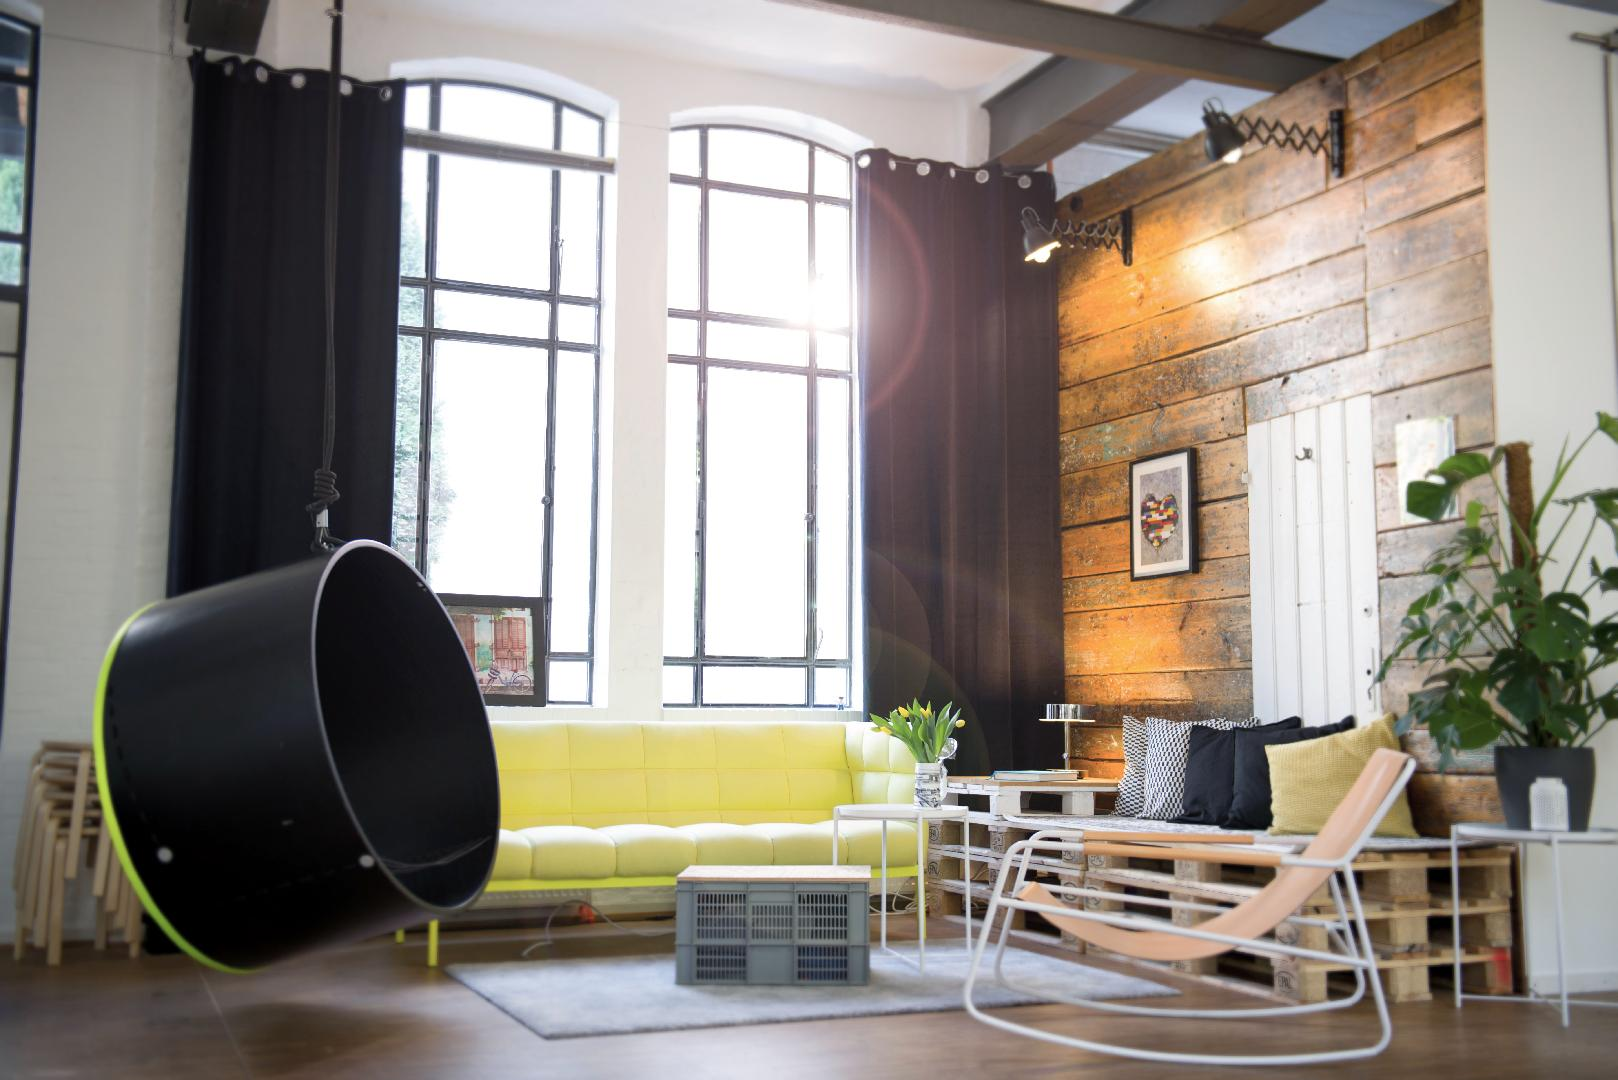 Picture 1 of Studio und Loft